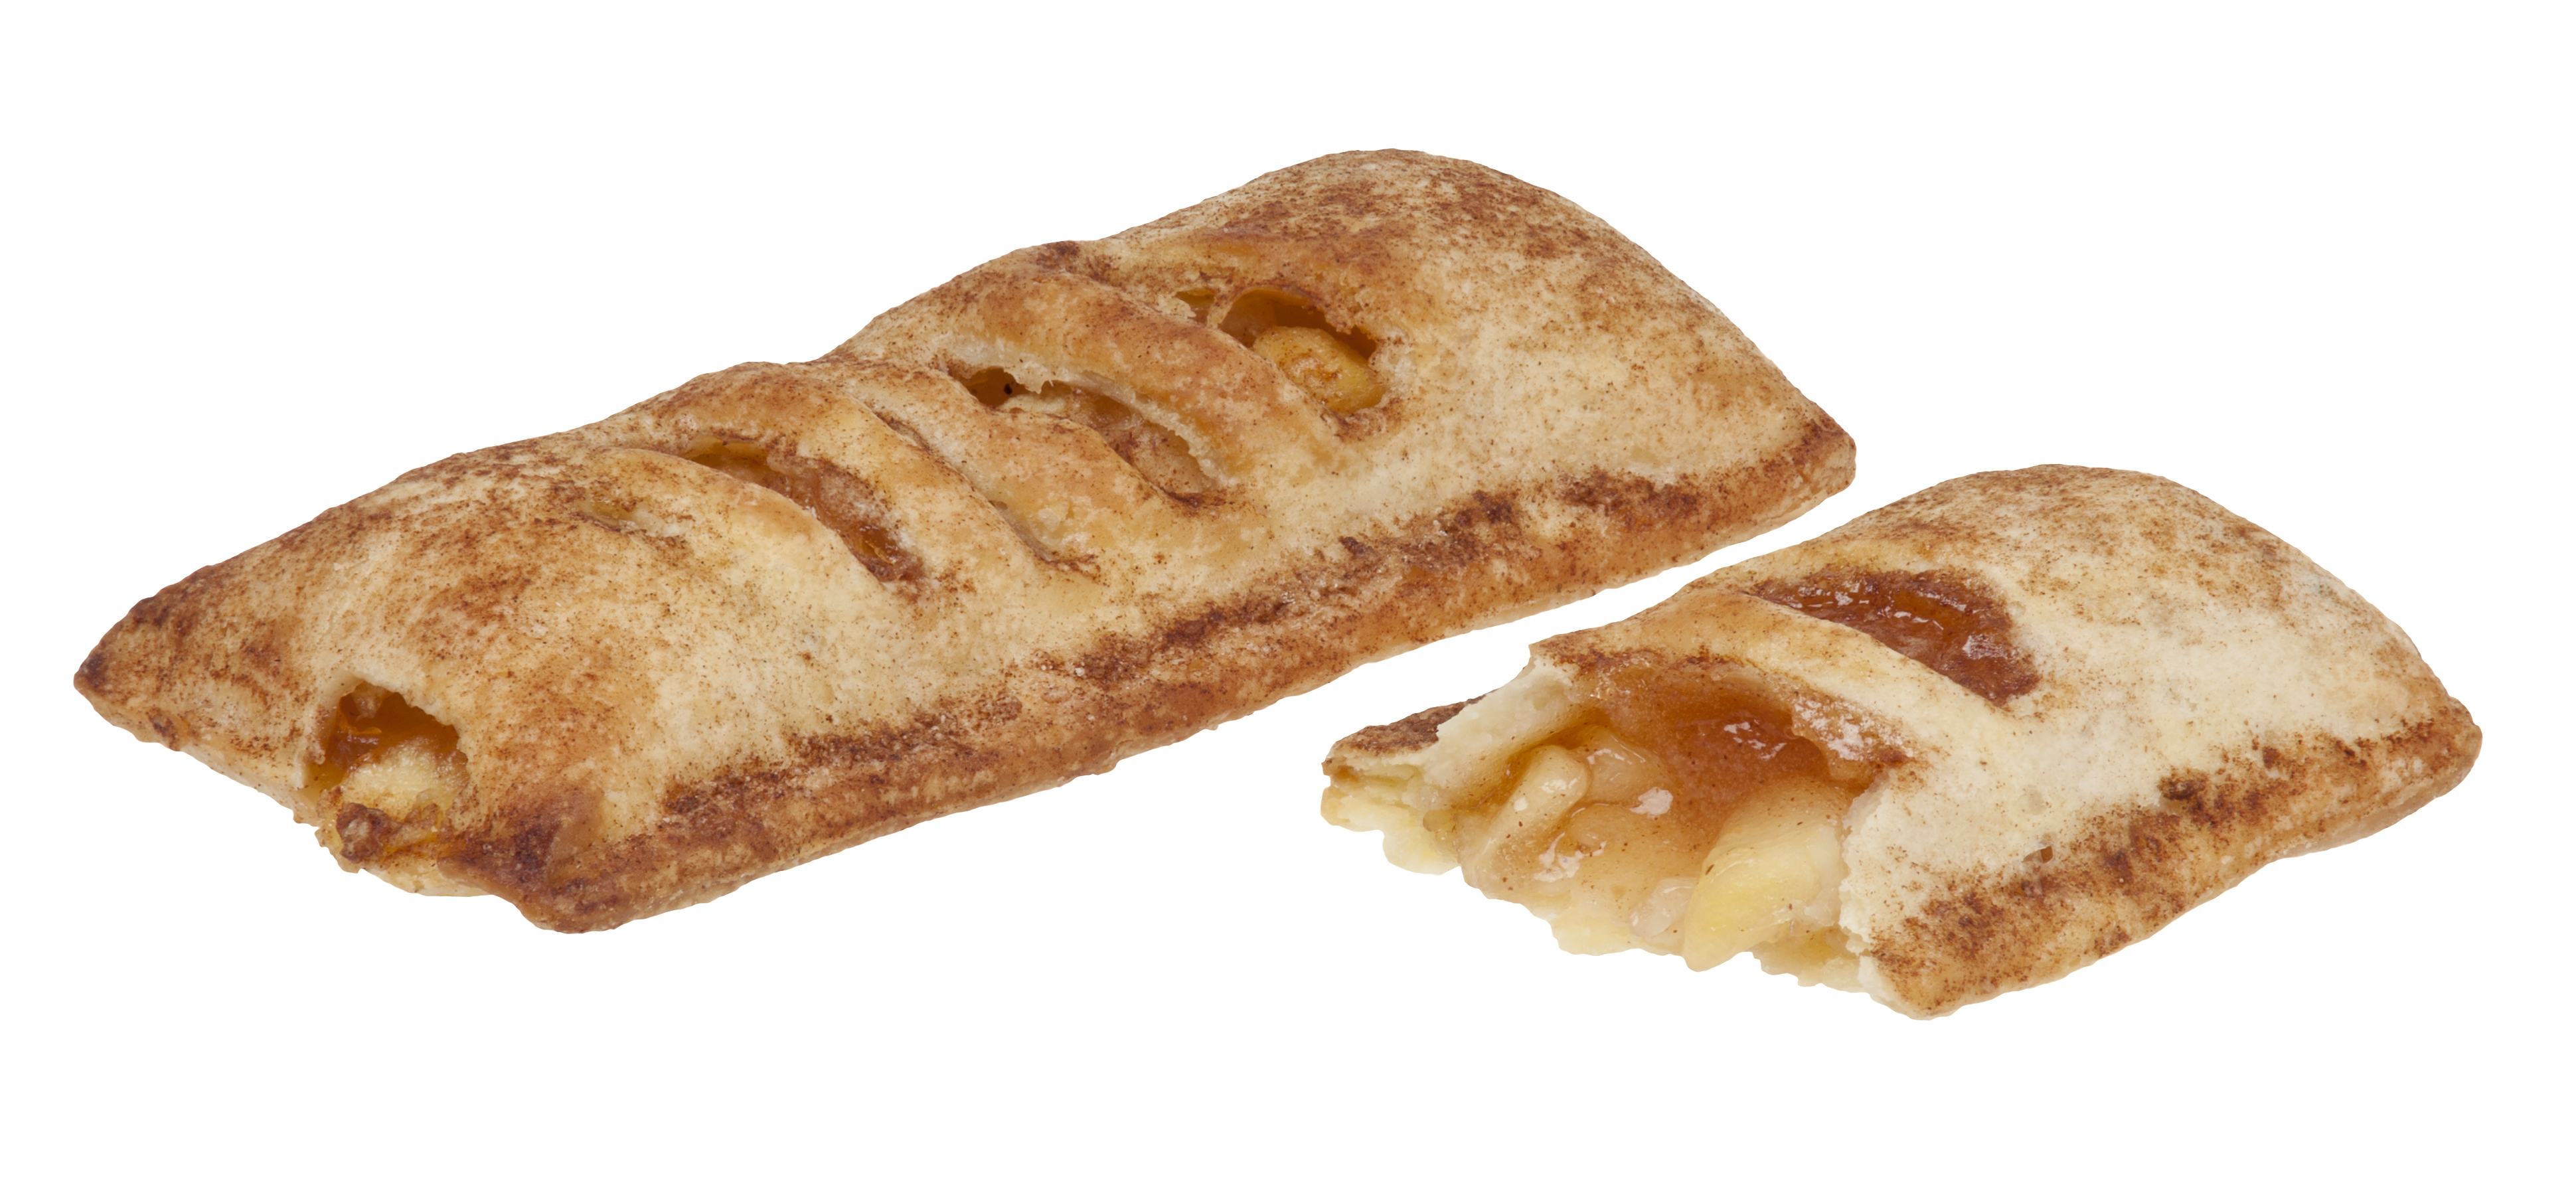 File:McD-Apple-Pie.jpg - Wikimedia Commons